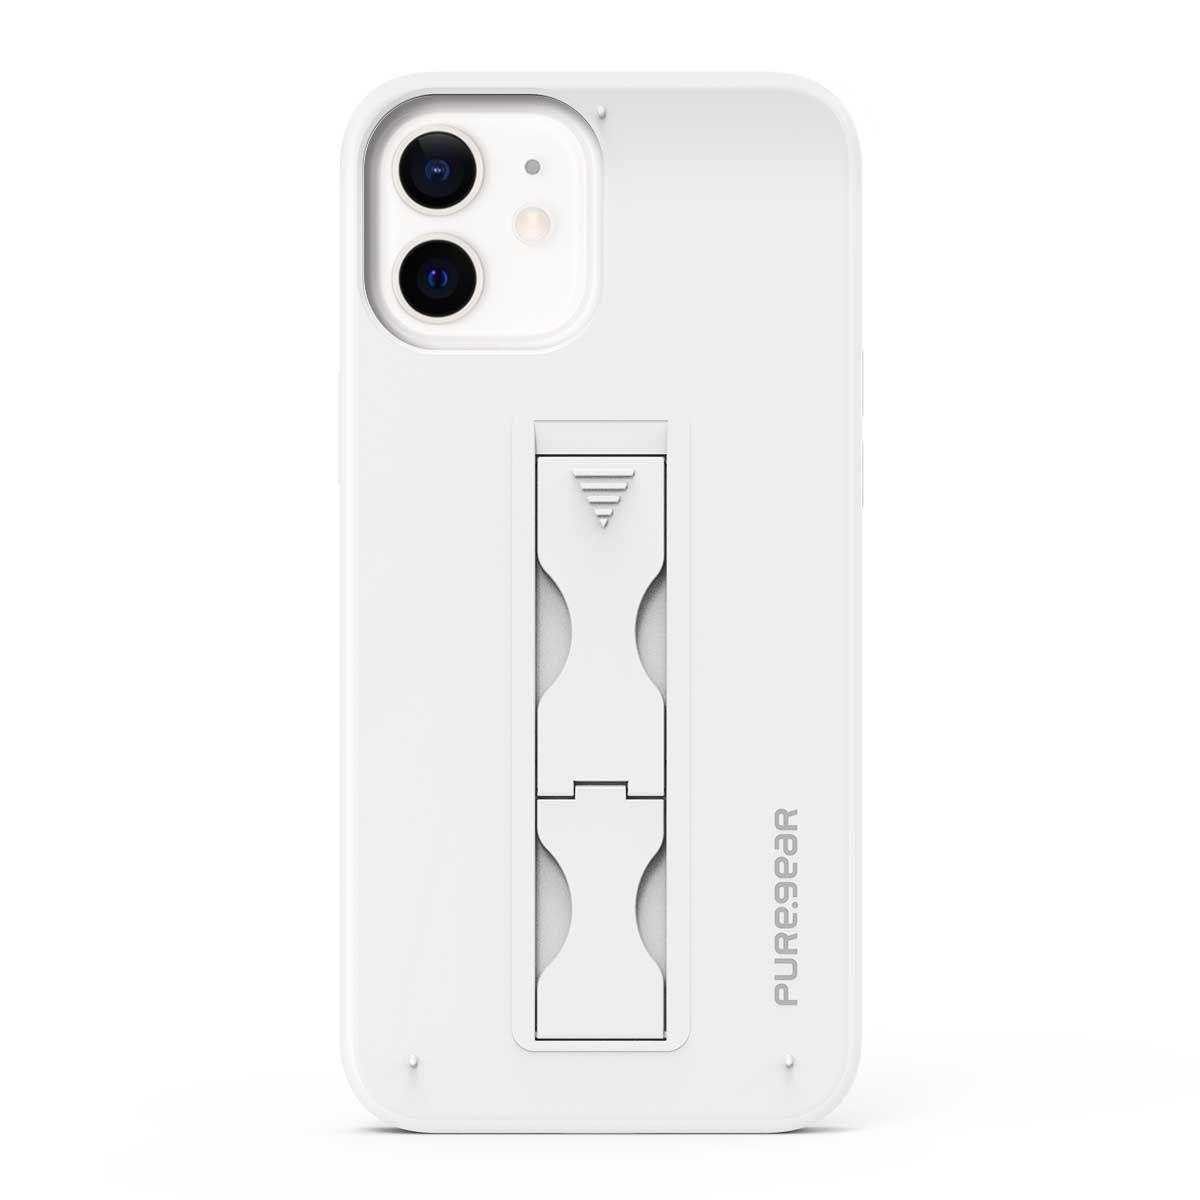 Apple iPhone 12/ 12 Pro SlimStik, Antimicrobial Kickstand Case – Whiteout